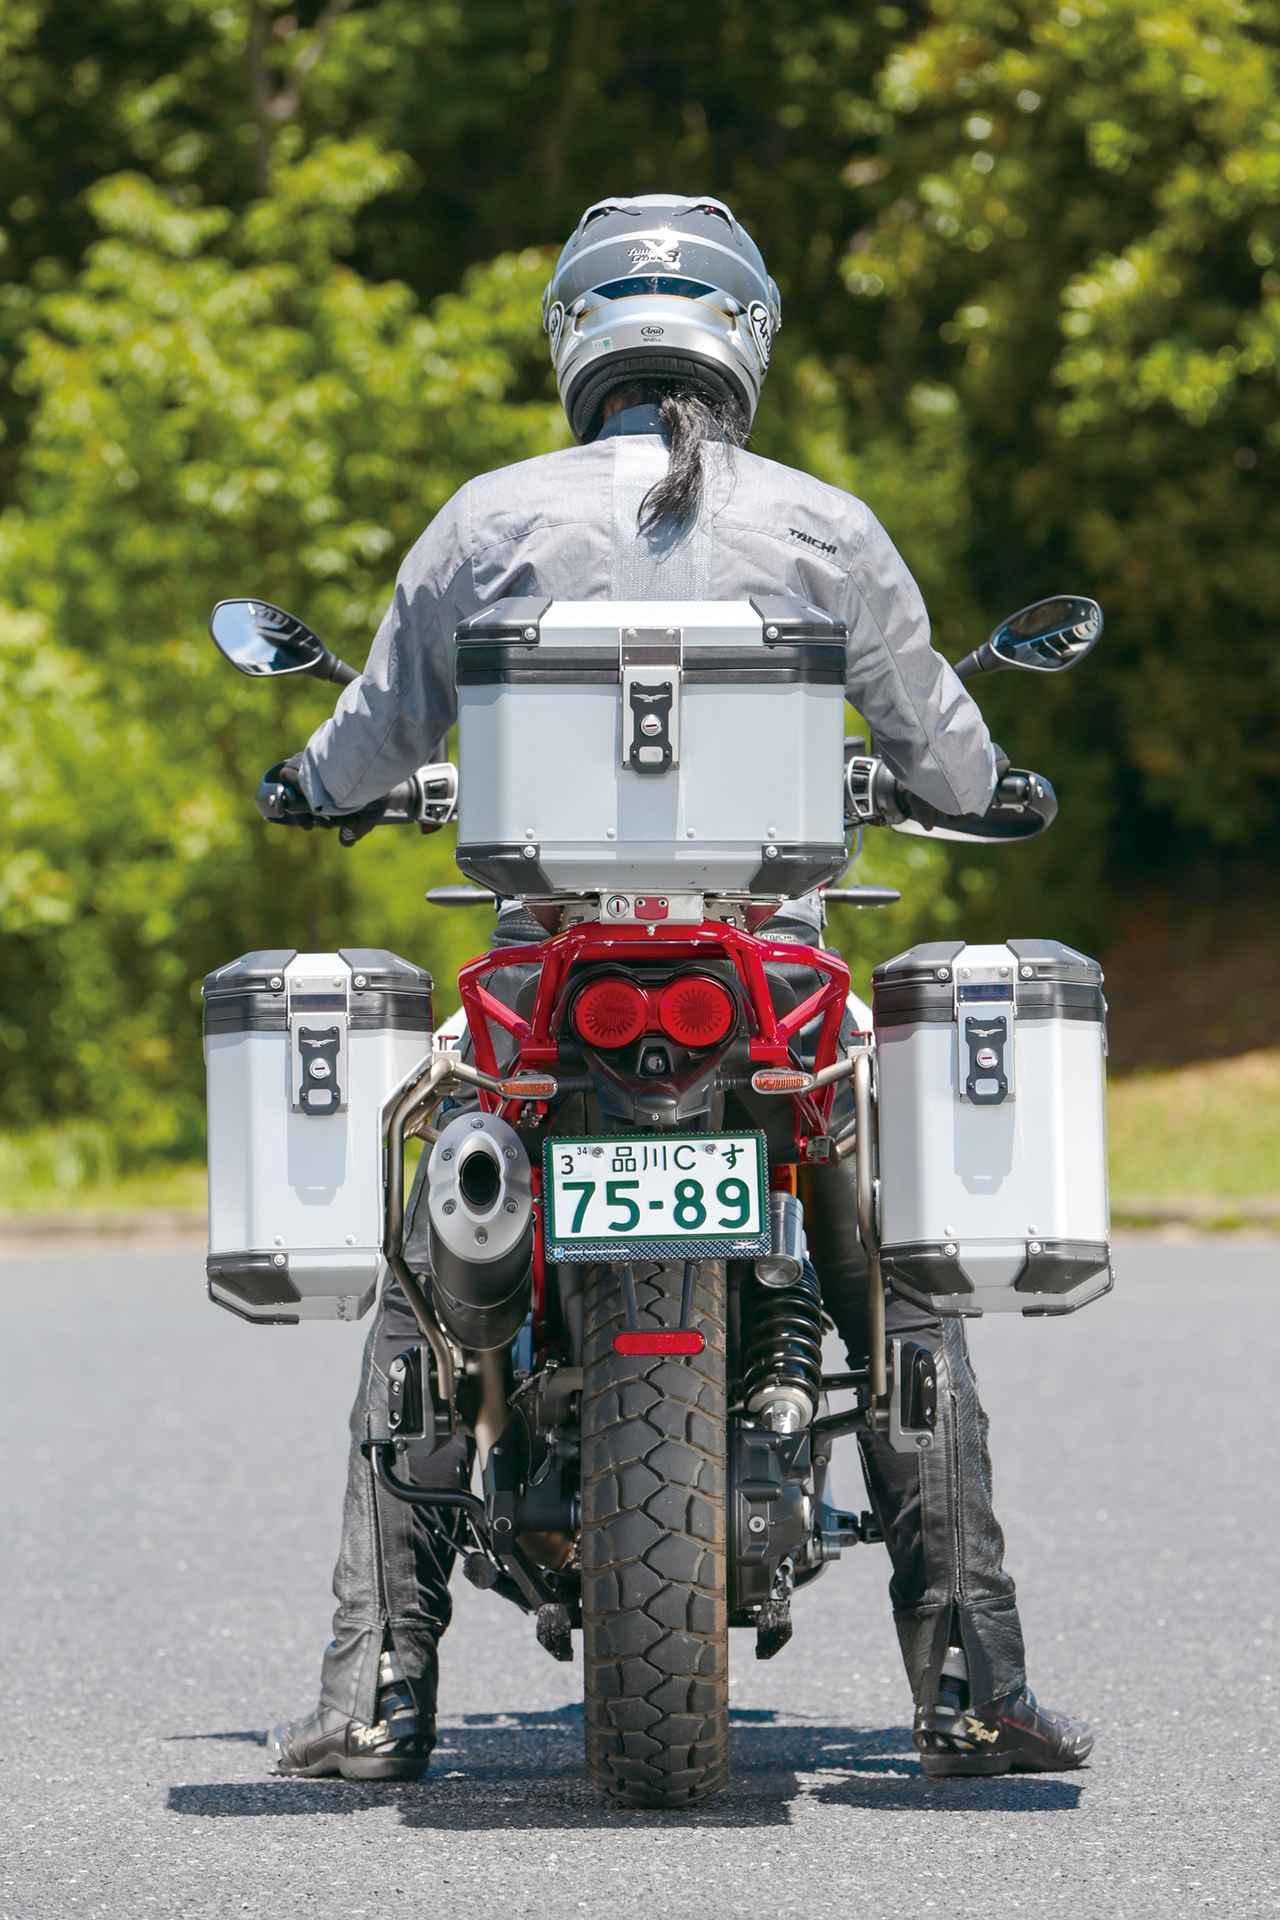 Images : 13番目の画像 - 「伝統の縦置きVツインが生み出すアドベンチャーの新境地!『MOTO GUZZI V85TT』(2019年) #試乗インプレ」のアルバム - webオートバイ